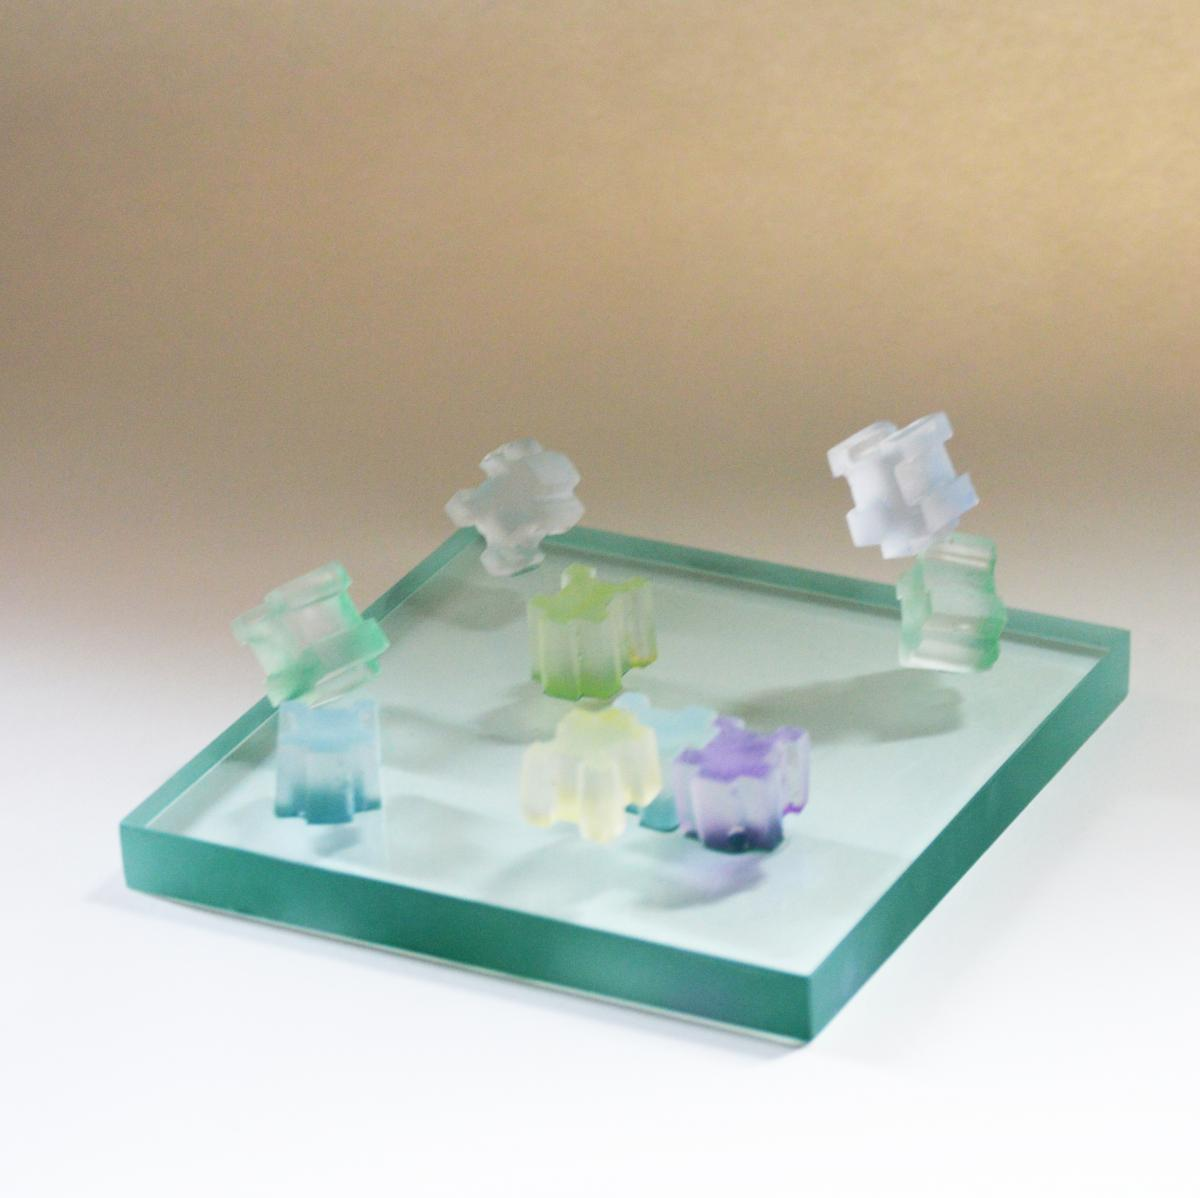 Alexander Draper - Puzzle Pieces